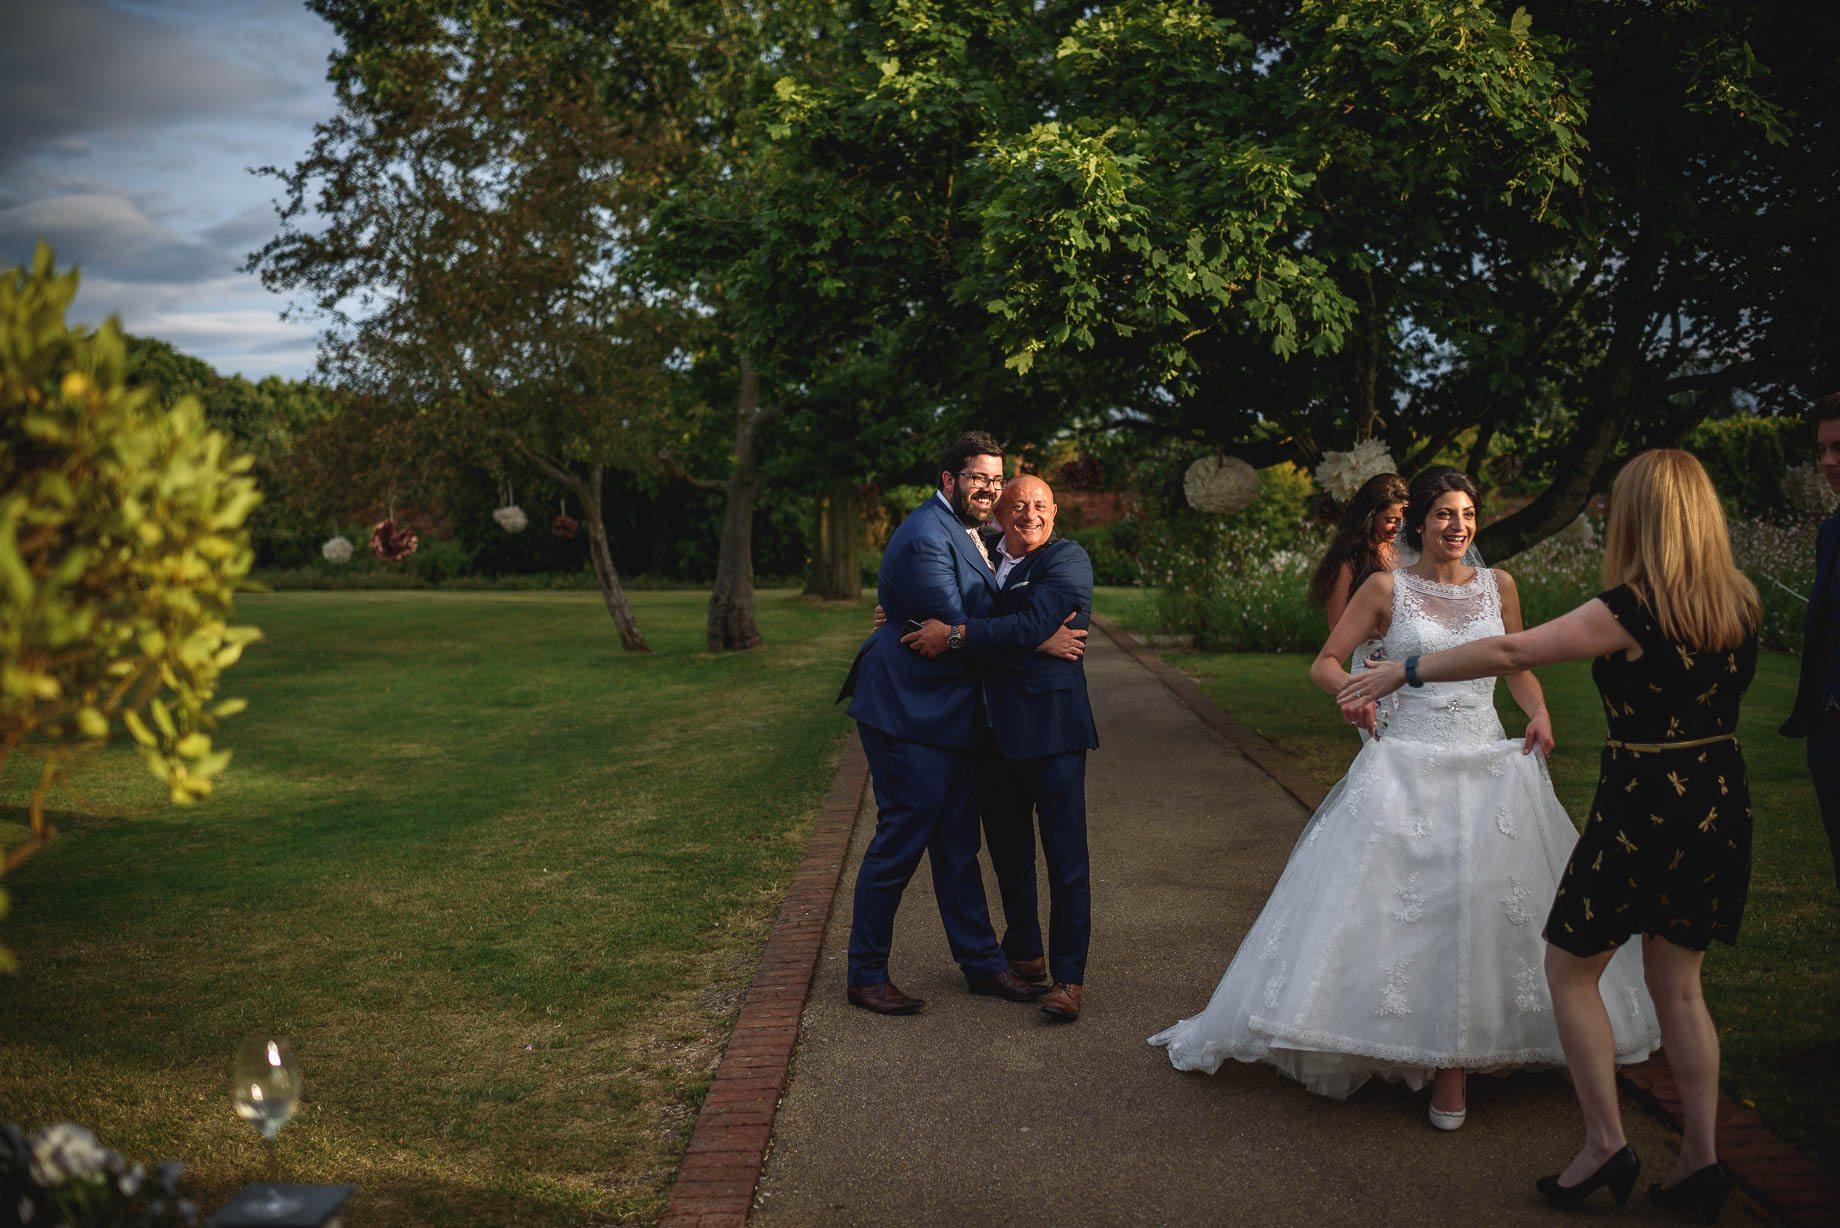 Gaynes Park wedding photography - Guy Collier Photography - Rachel and Jon (154 of 169)